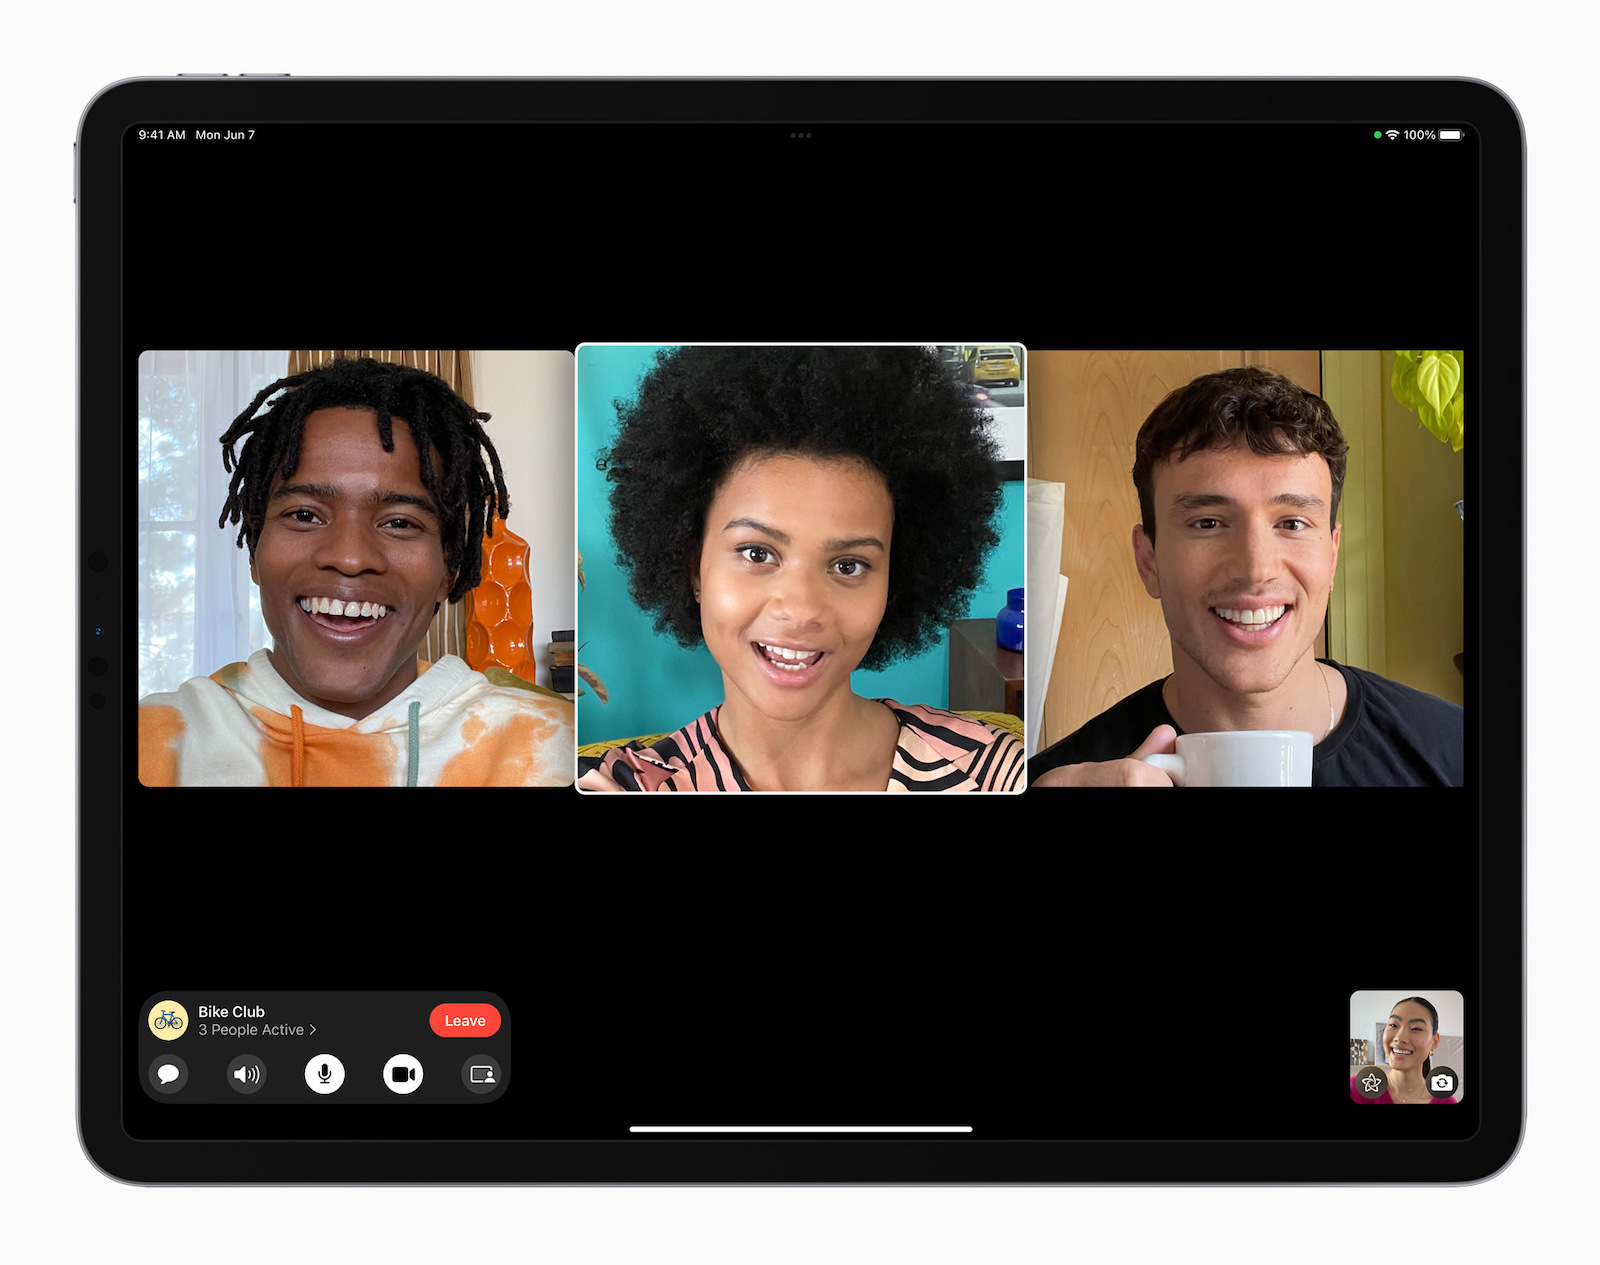 iPadOS 15 FaceTime